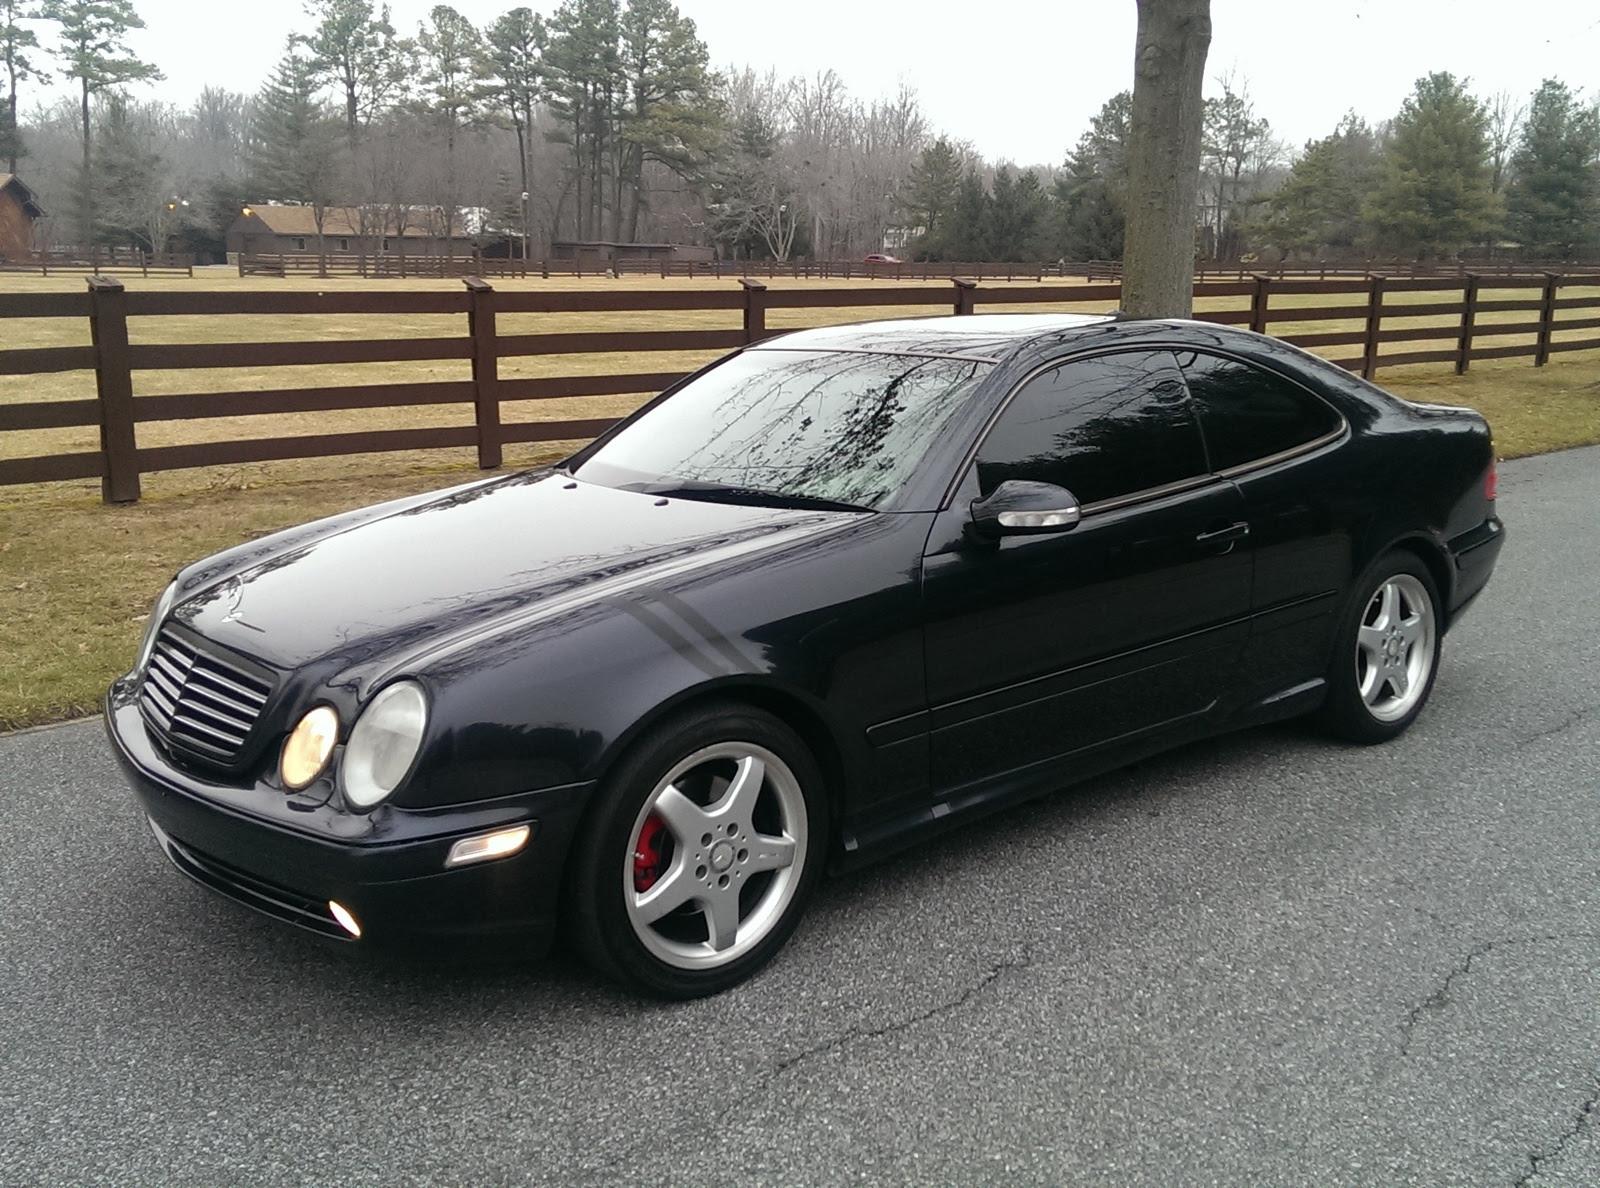 2002 Mercedes-Benz CLK-Class - Pictures - CarGurus